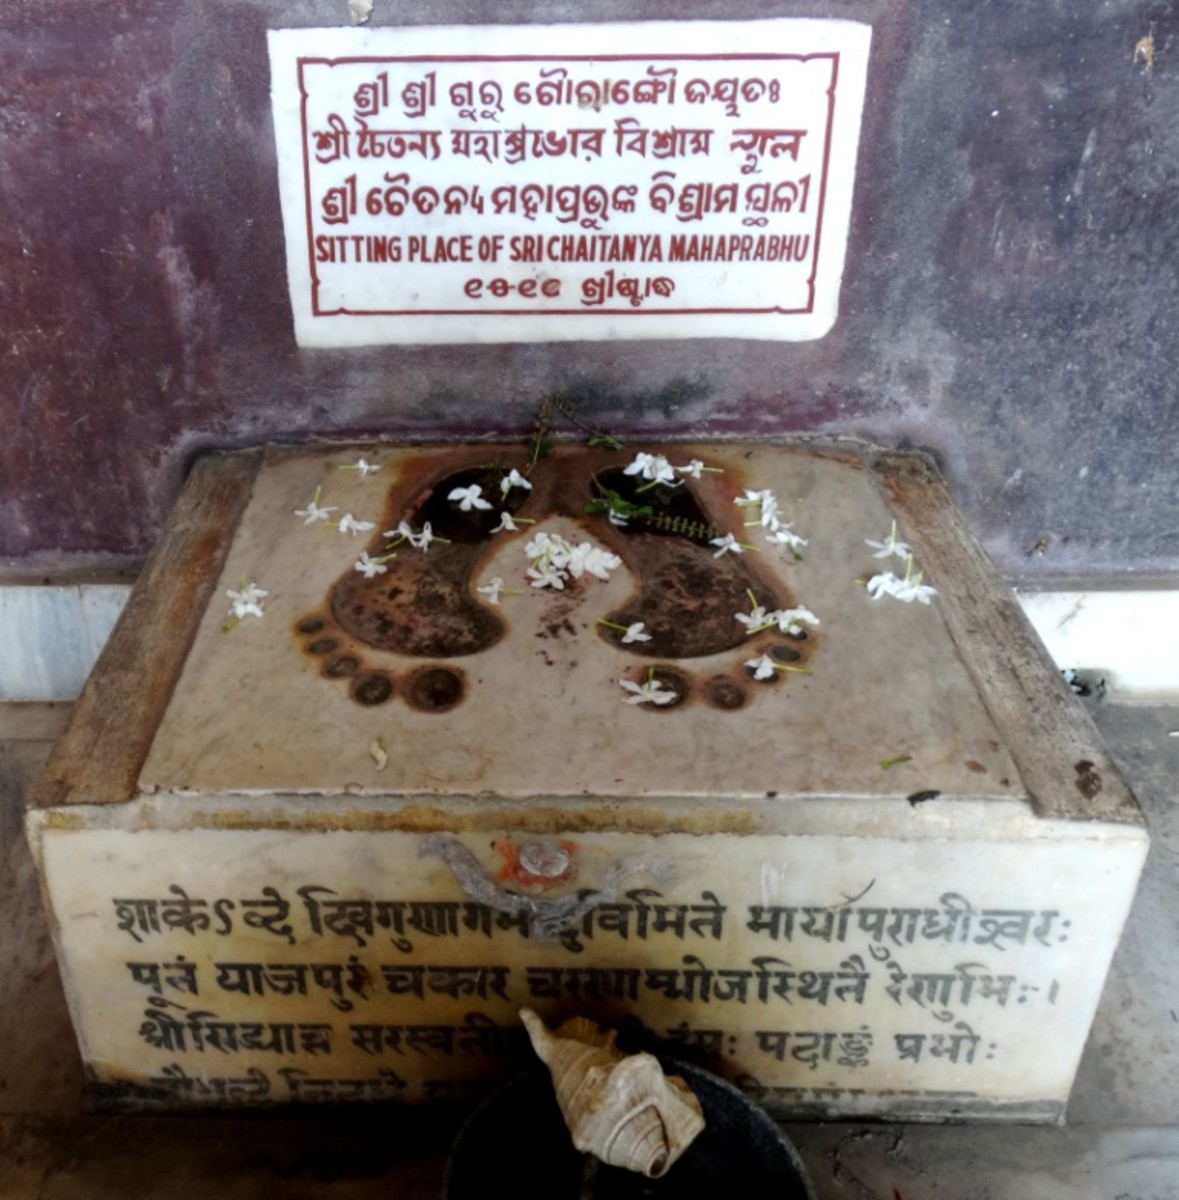 The footprint of Chaitanya Deva